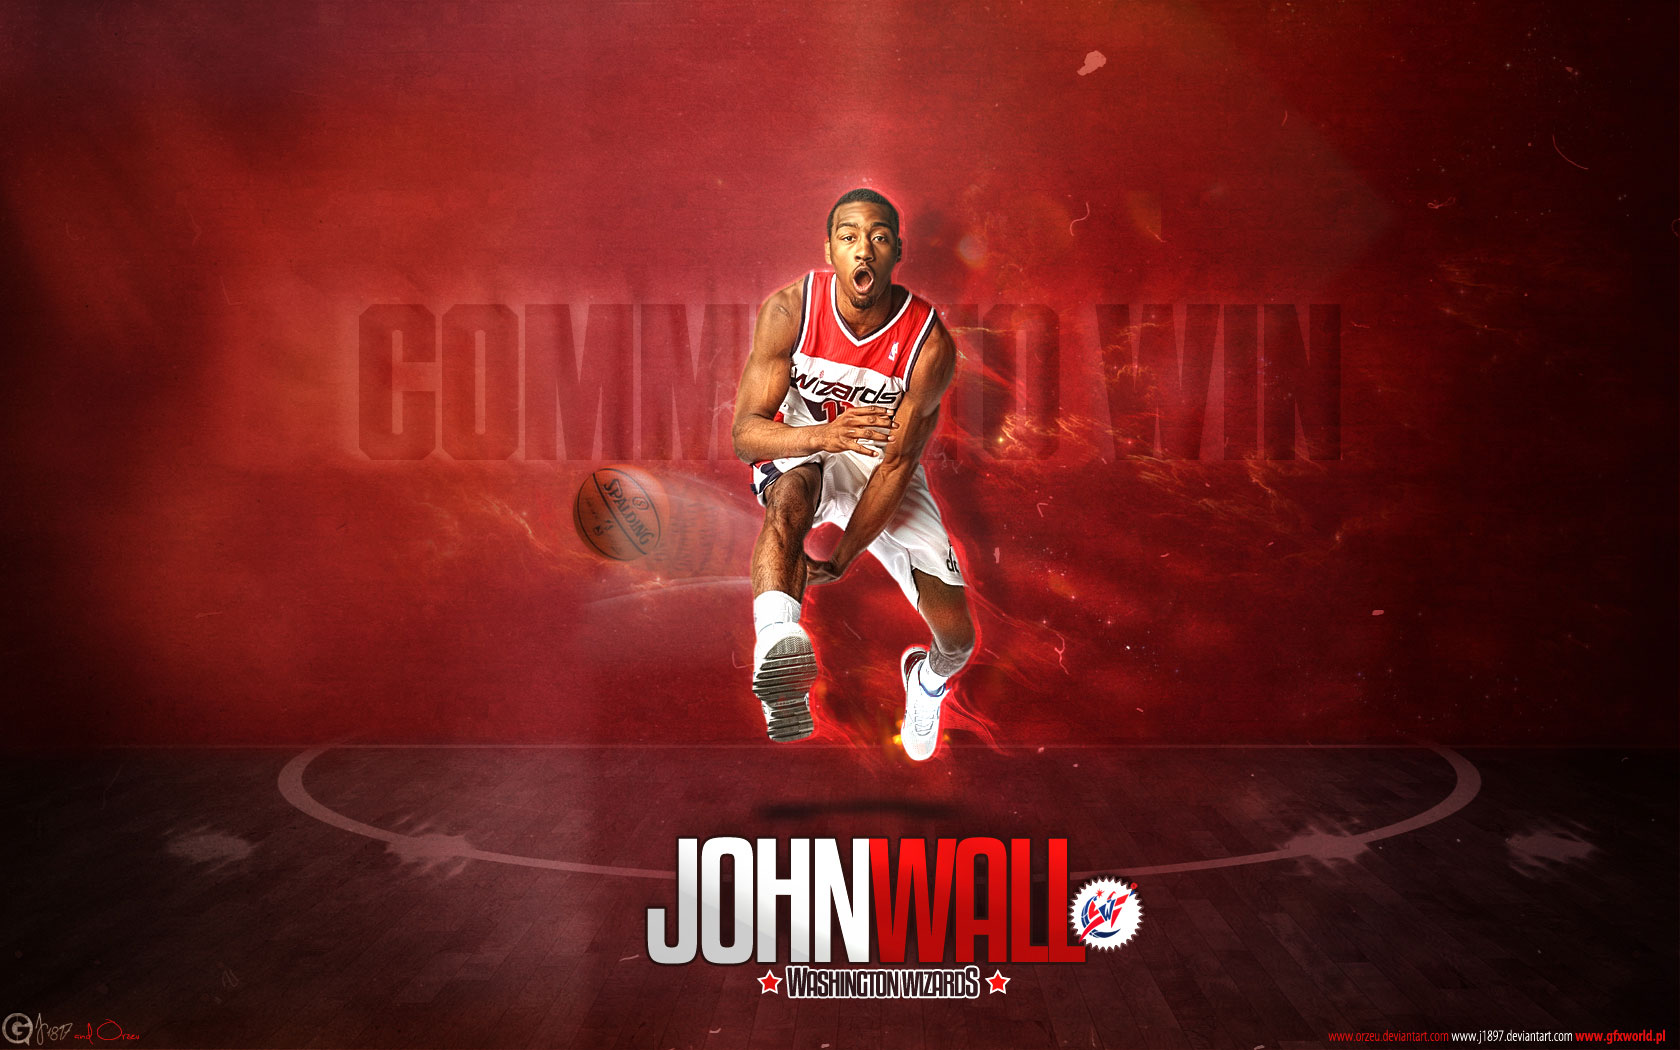 John Wall Wallpapers Basketball Wallpapers At Basketwallpapers Com